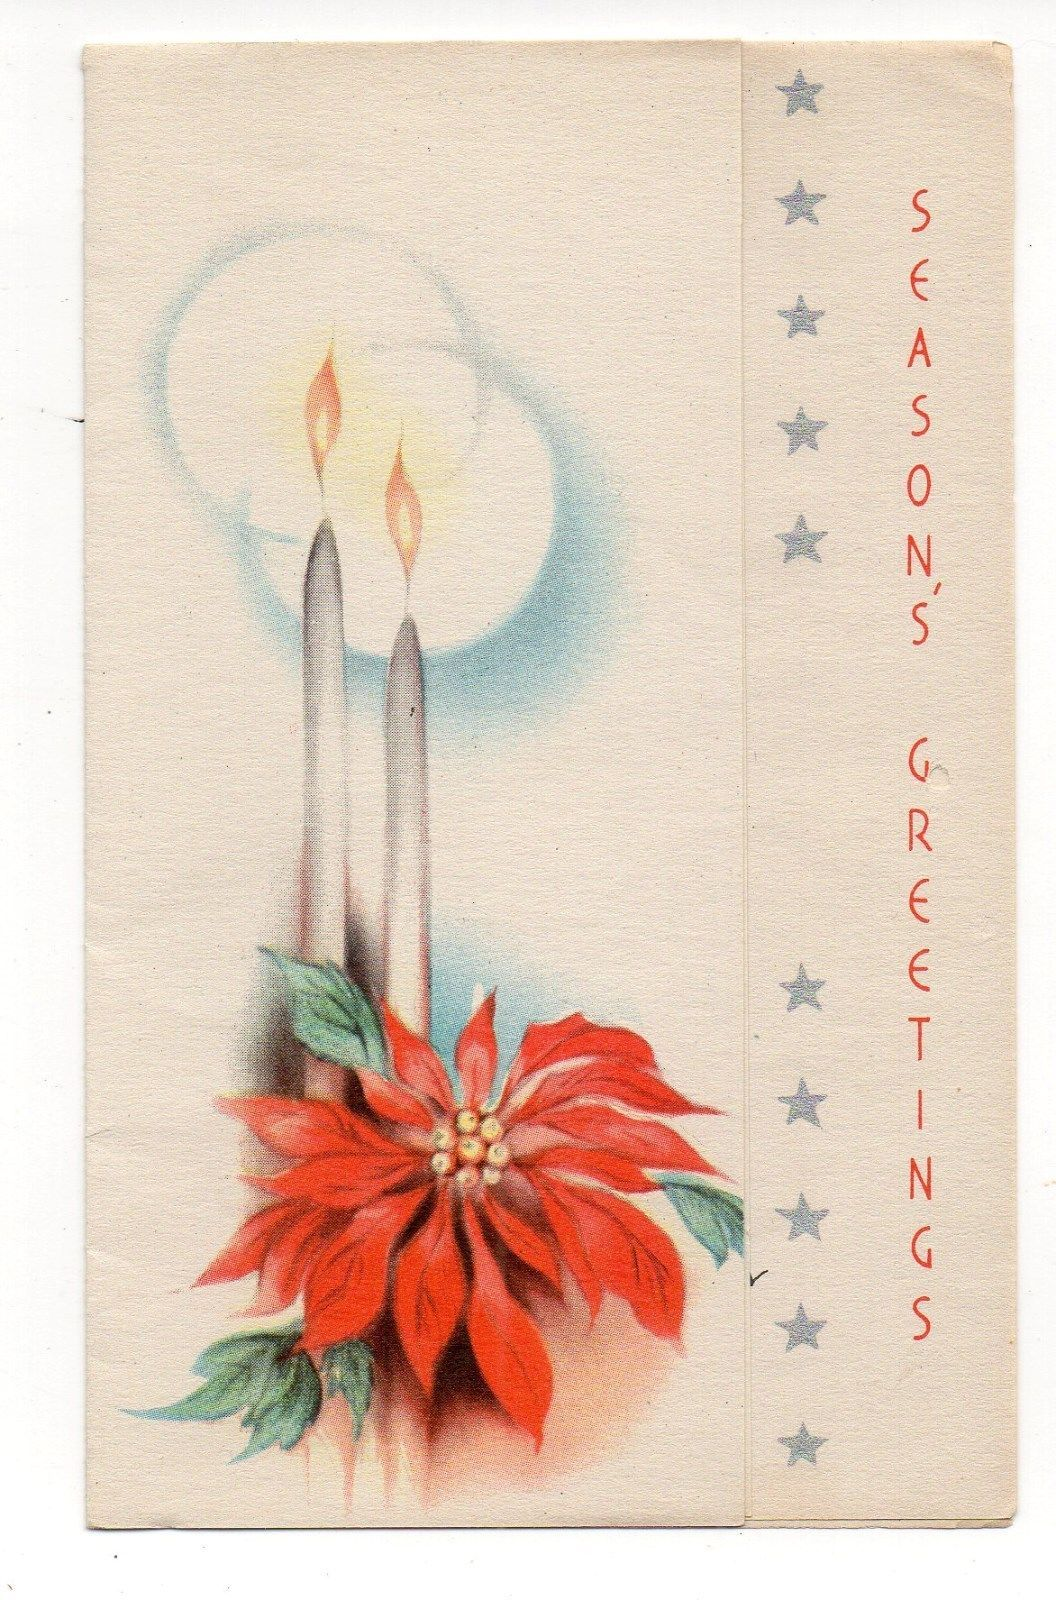 Vintage Christmas Greeting Card Burning Candles Poinsettia | eBay